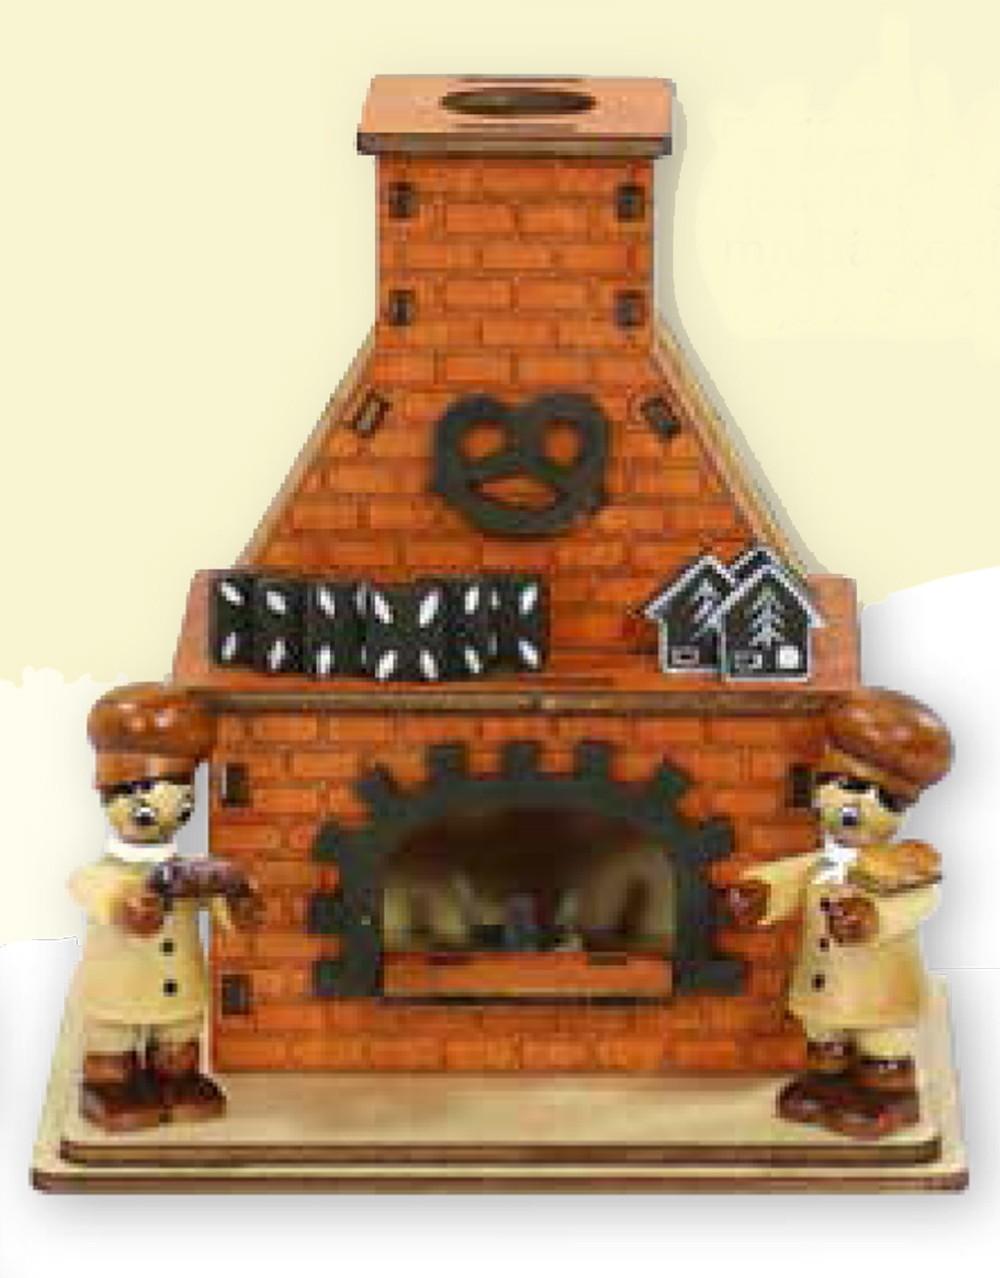 Räucherhaus mit 2 Bäckerfiguren ca. 13 x 12 x 9 cm